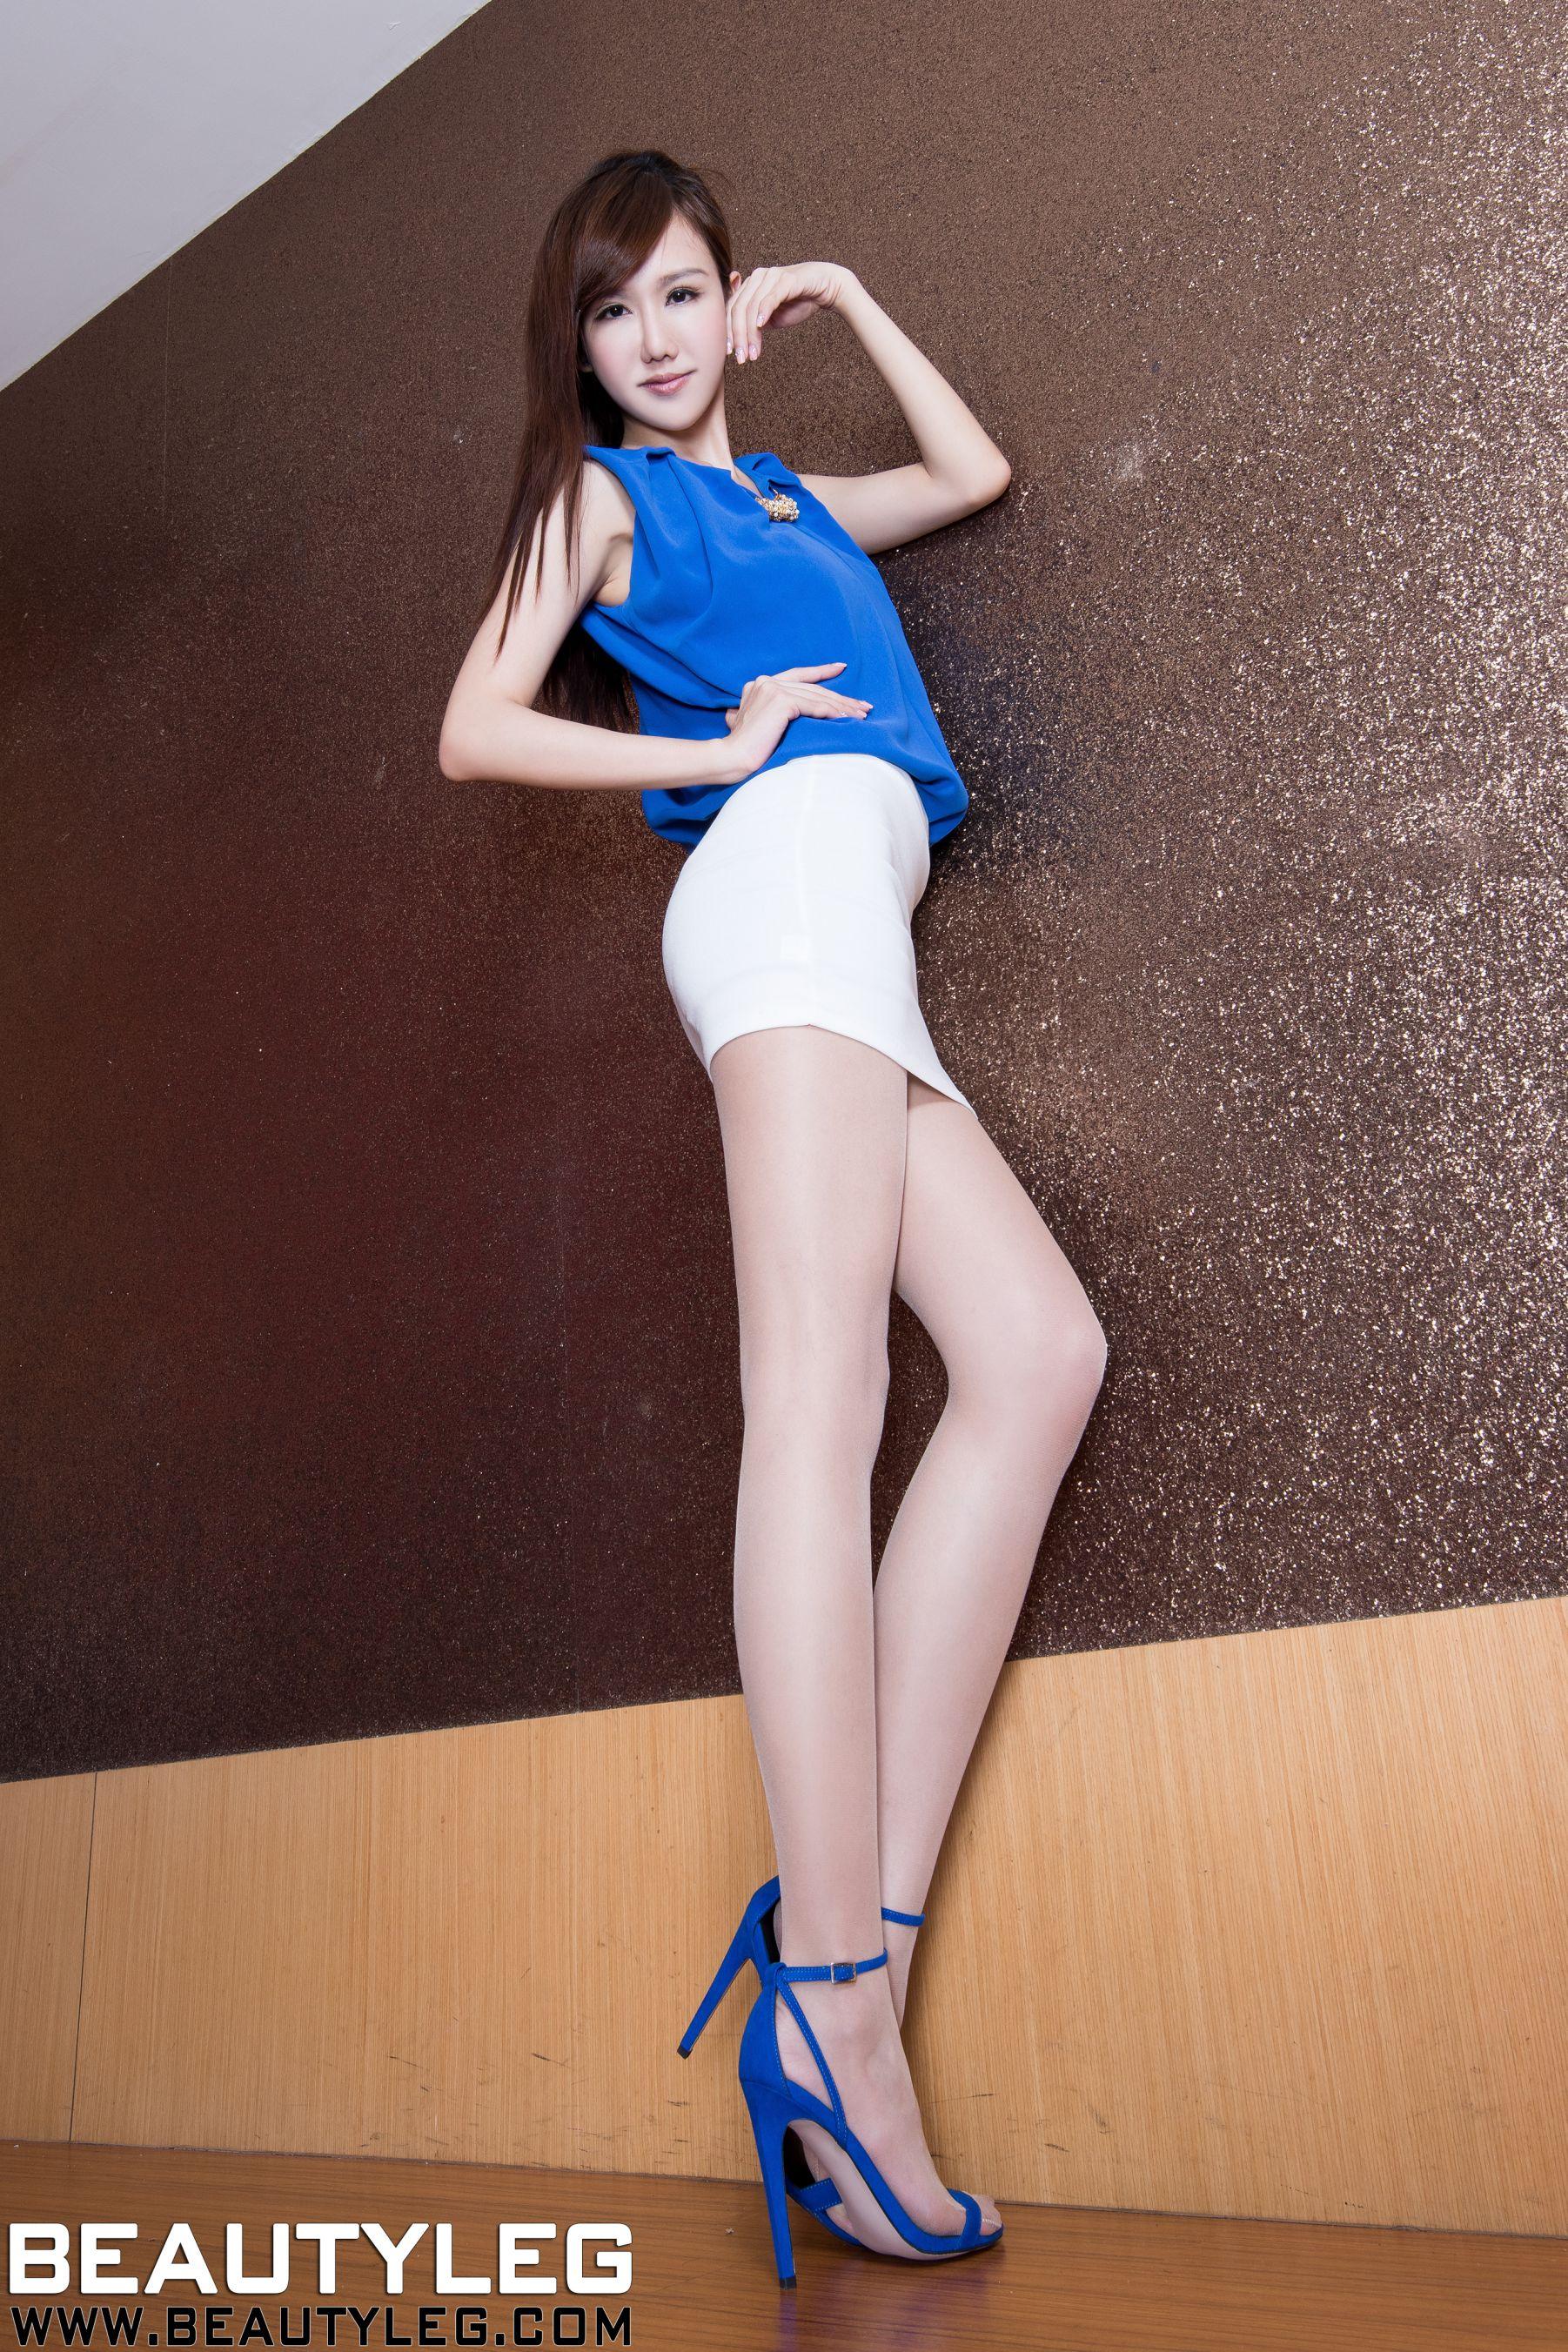 VOL.997 [Beautyleg]高跟美腿:林瑞瑜(Beautyleg Sara,腿模Sara)高品质写真套图(52P)